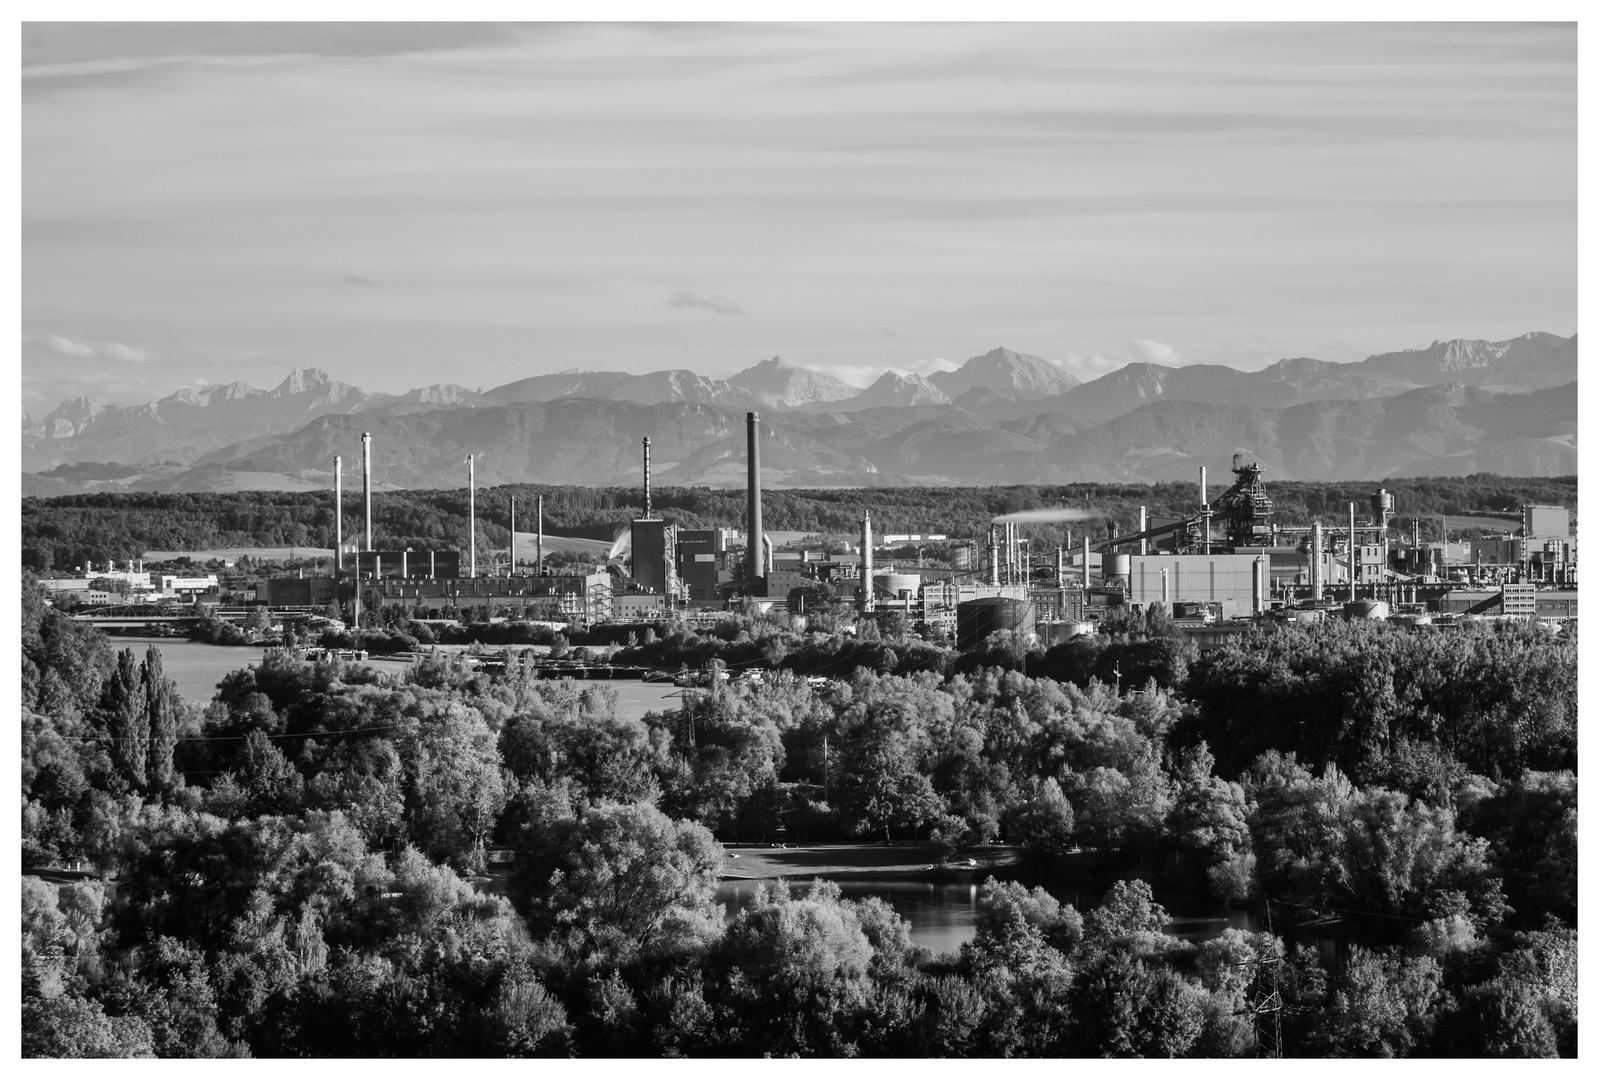 Erholungs- und Industriegebiet, Linz (A)